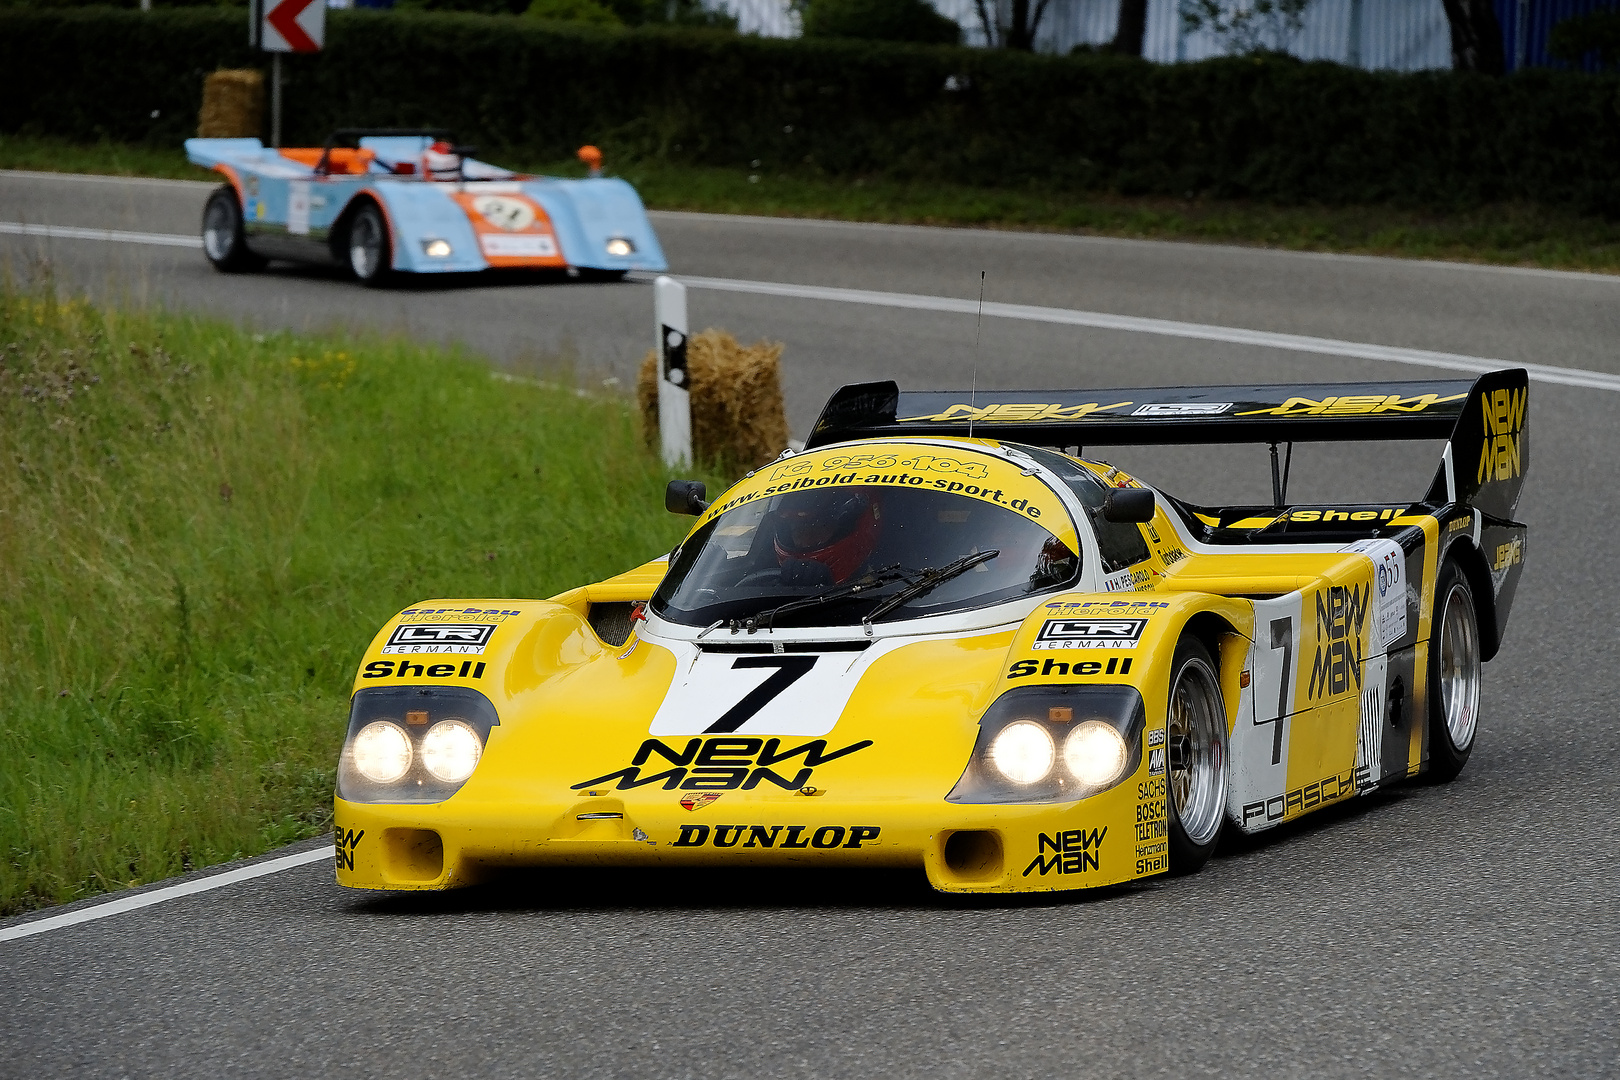 NEW MAN Porsche 956